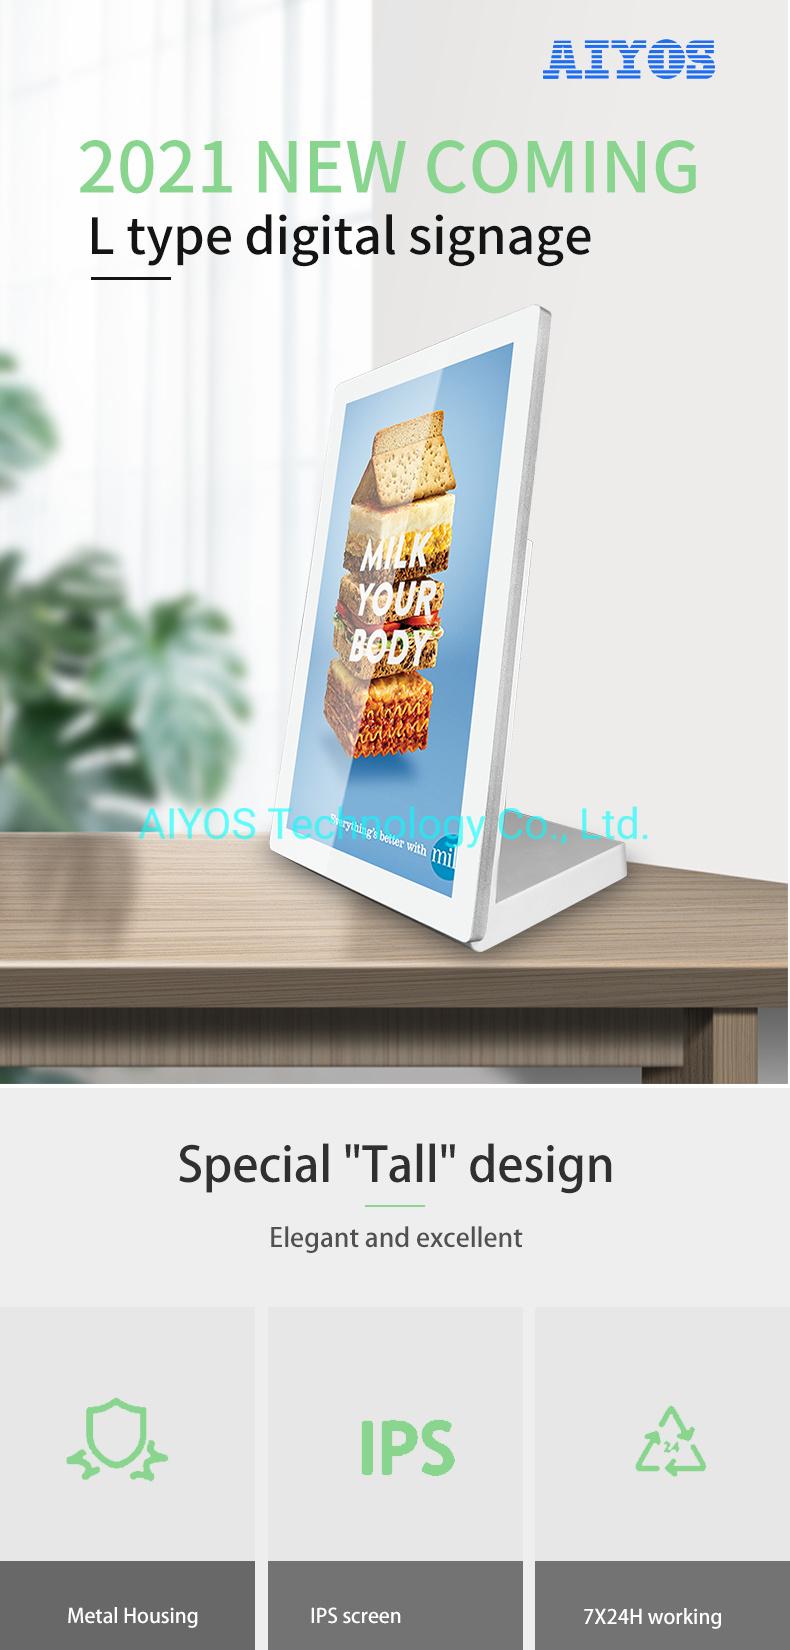 Wall Mounted 15.6inches WiFi Digital Photo Frames LCD display Digital Signage